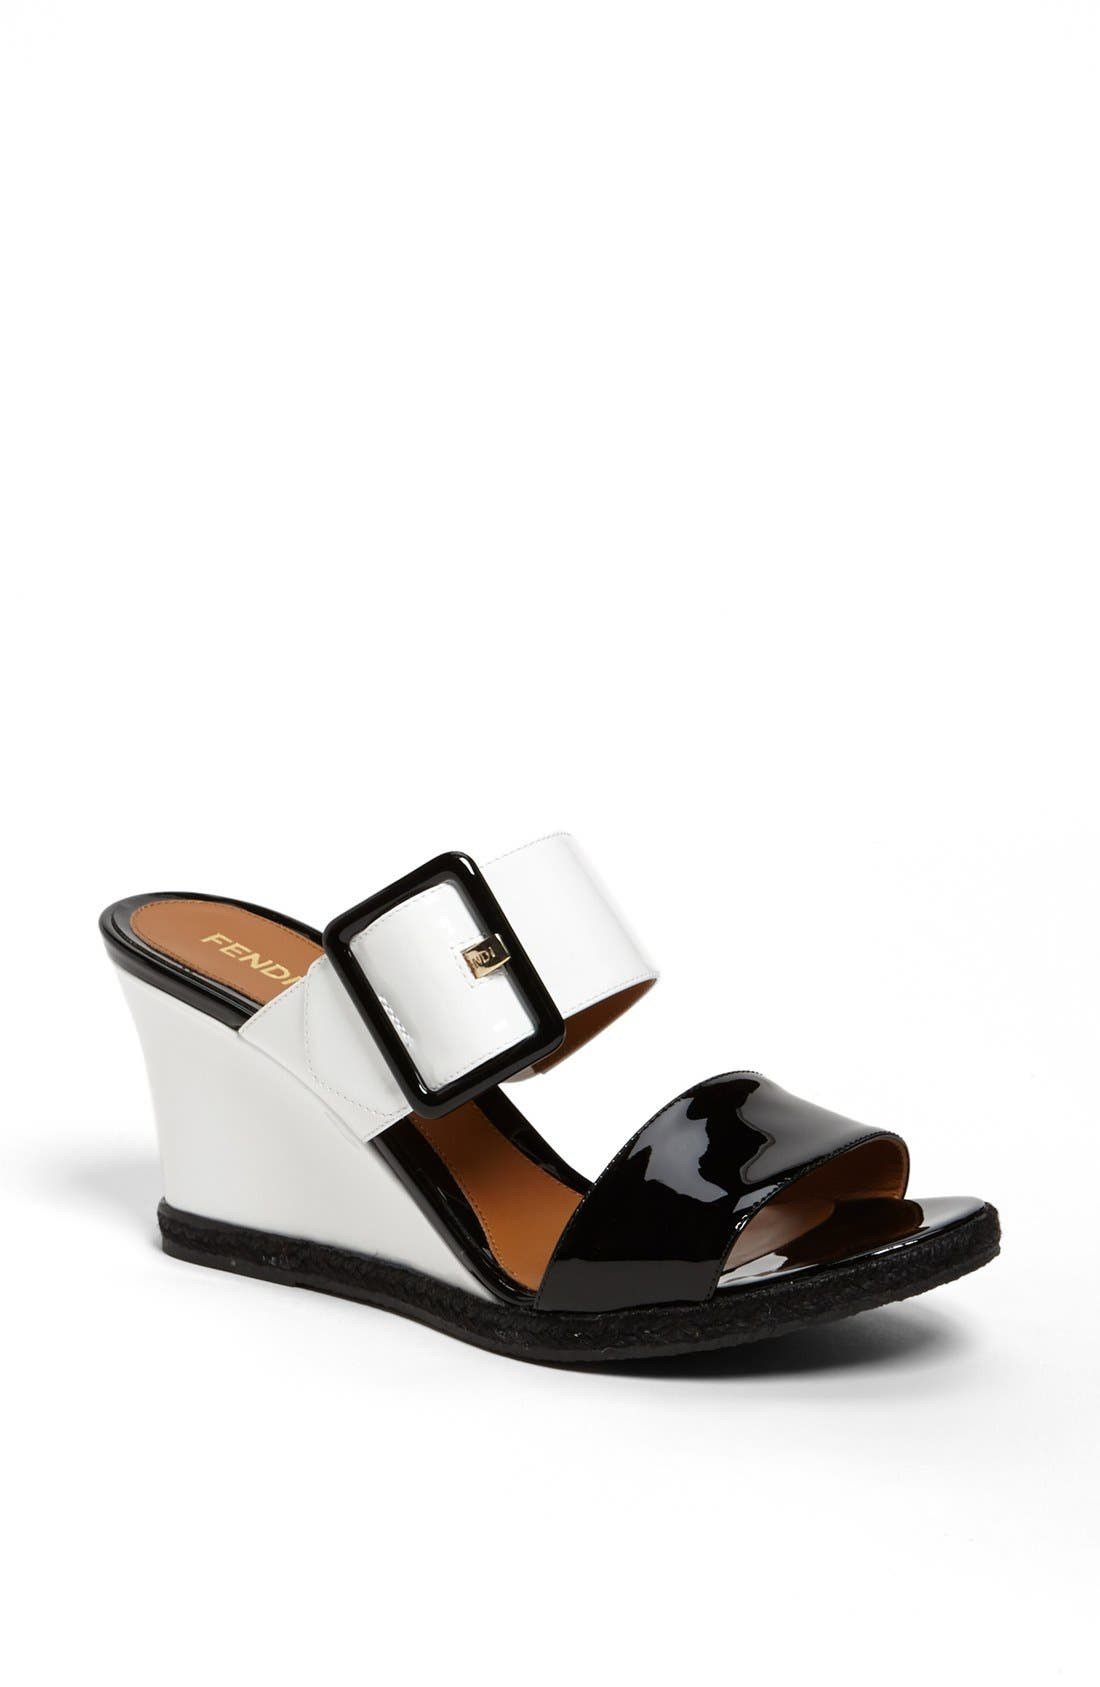 Main Image - Fendi 'Vernis' Wedge Sandal